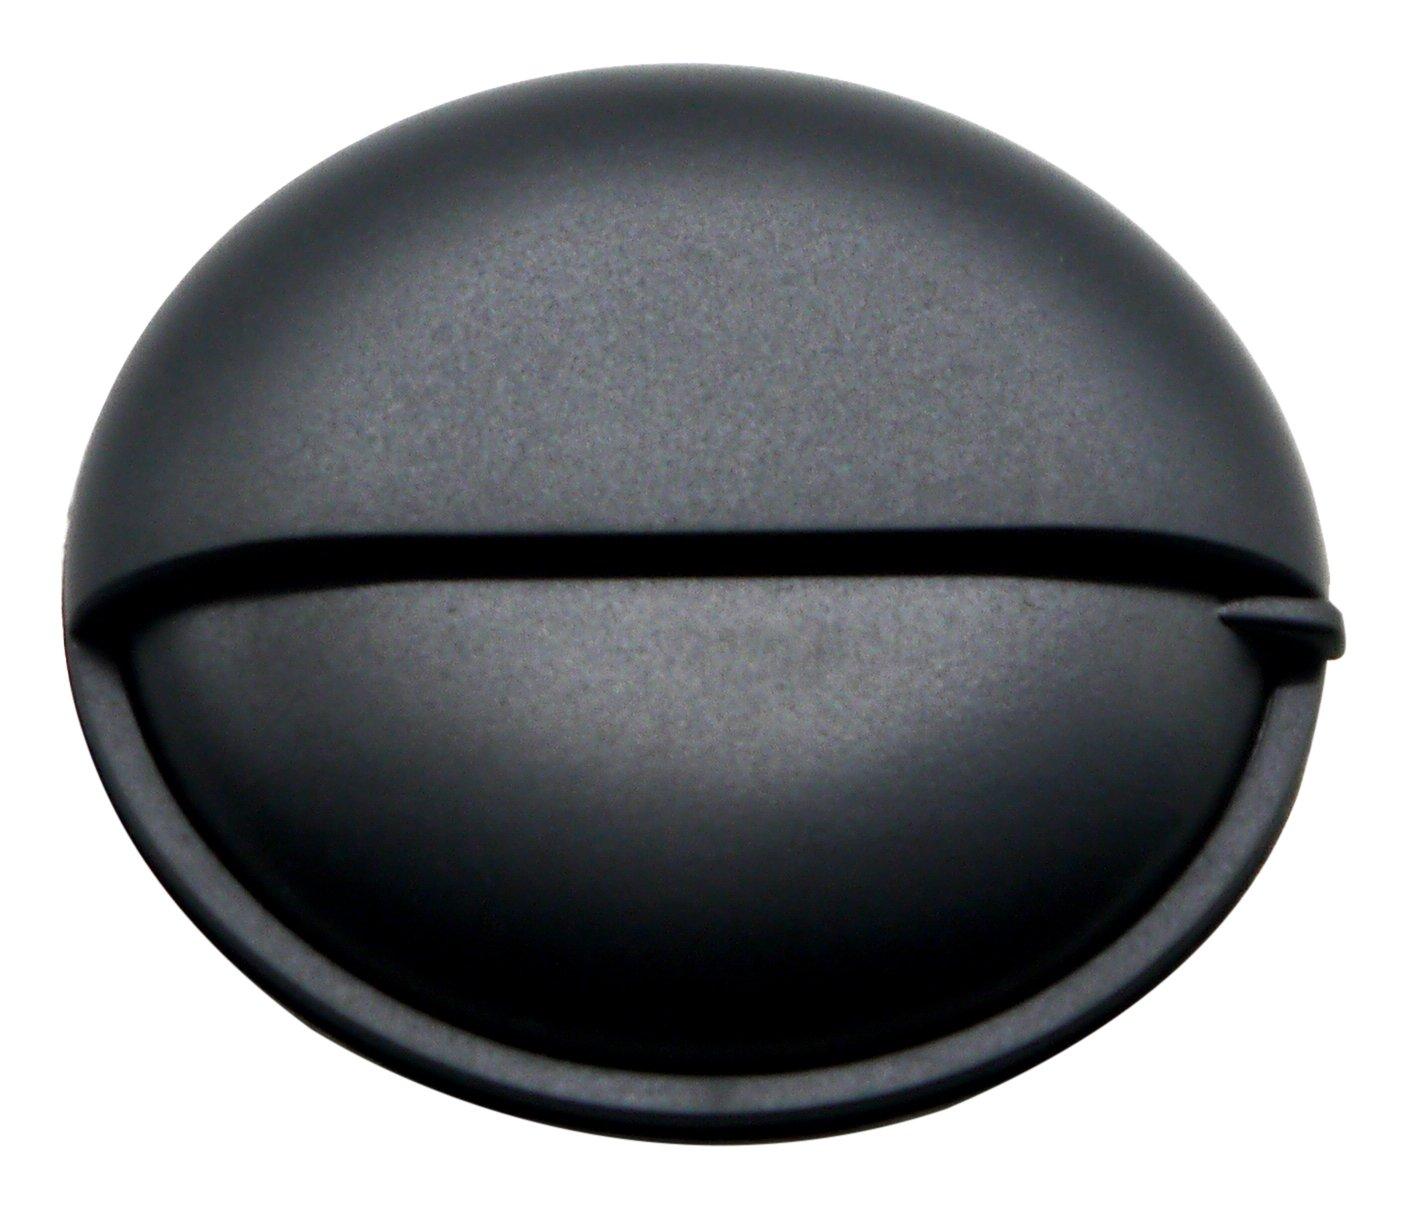 PuTwo Pill Organizer for Purse, Small Travel Pill Case, Round Metal Pill Box-Black